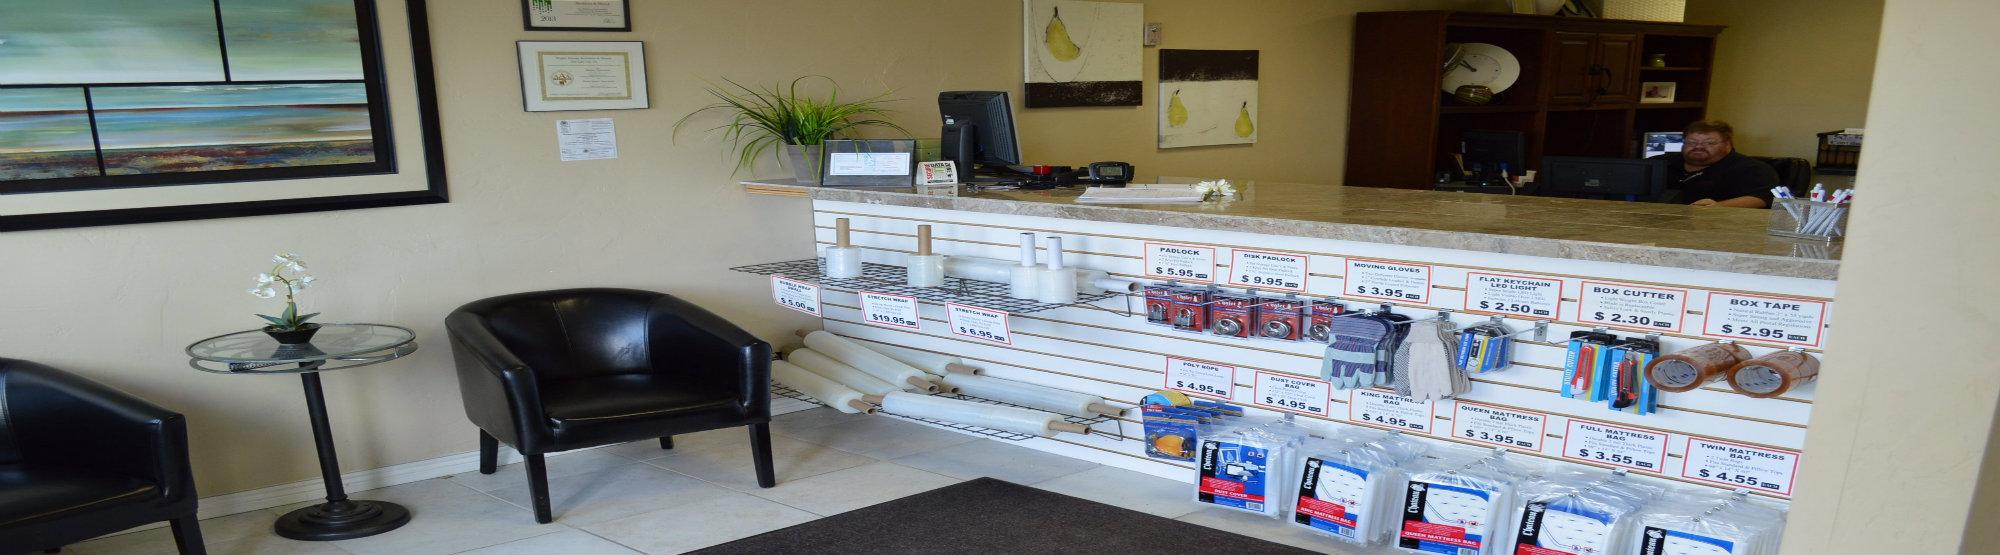 Charmant Affordable Self Storage In Salt Lake City!